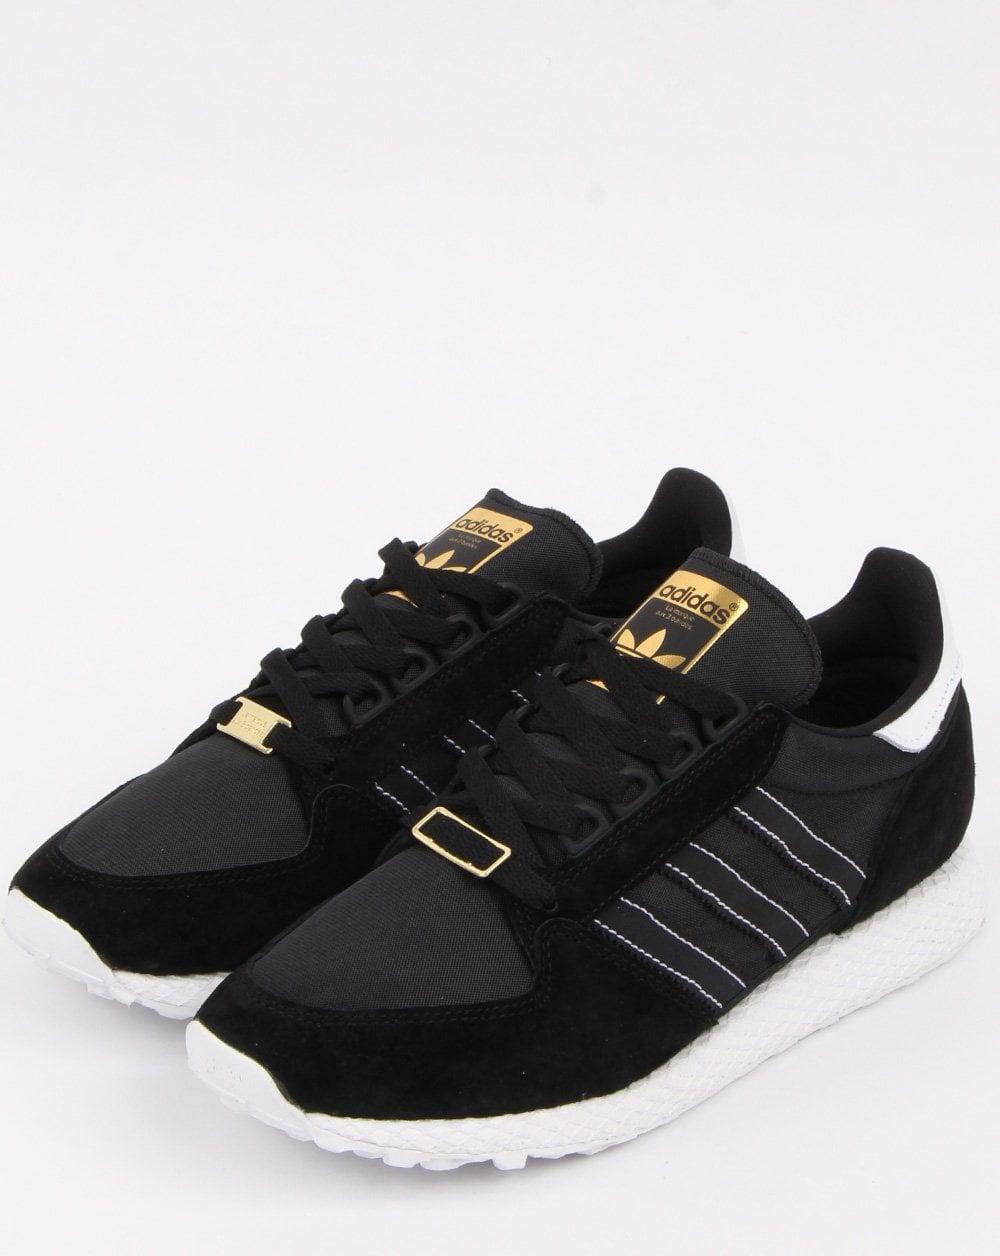 Influencia Preocupado collar  Adidas Forest Grove Trainers Black/Gold - 80s Casual Classics